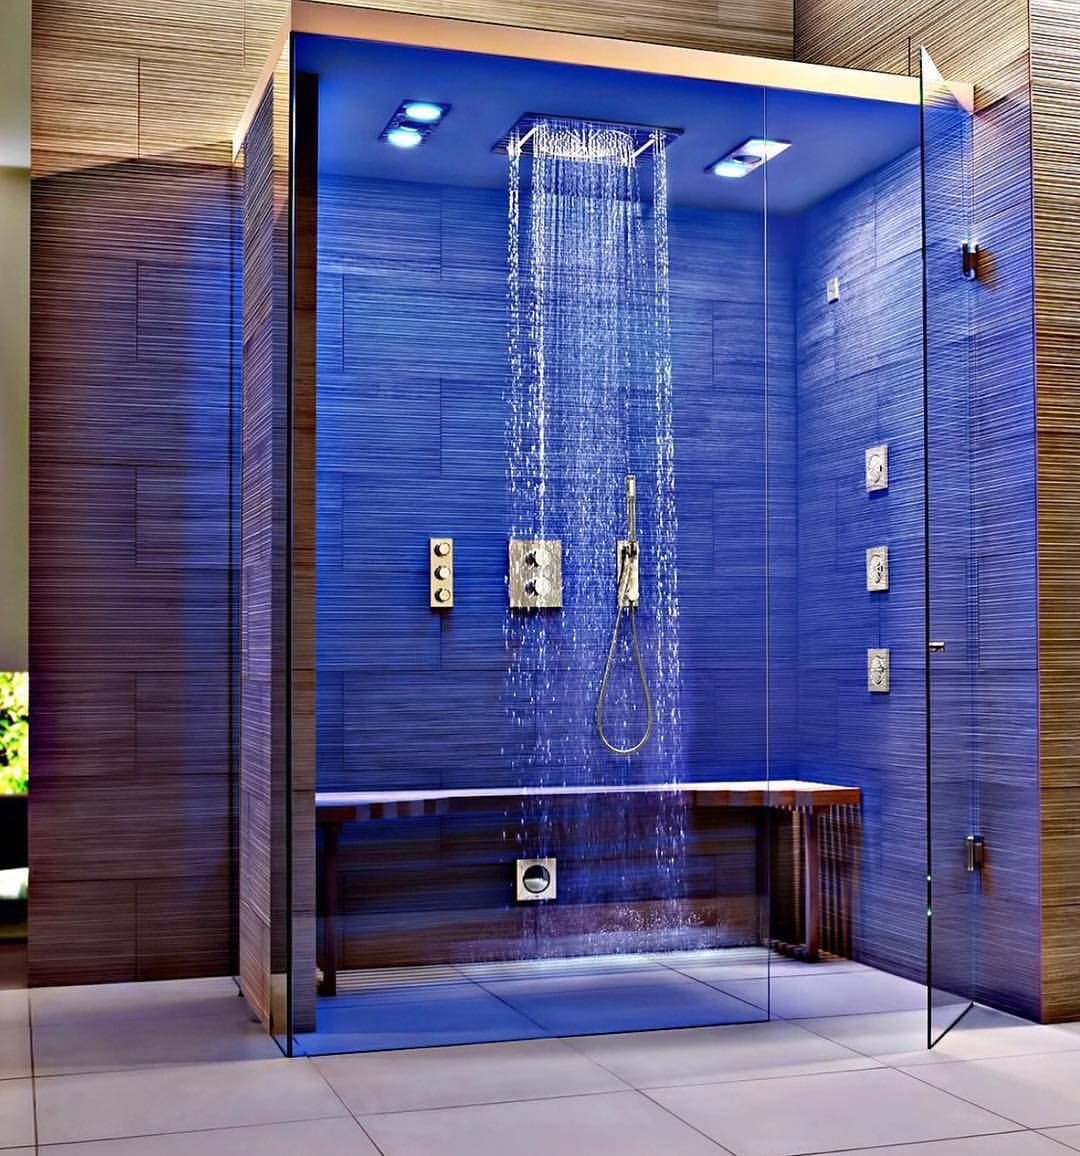 Stunning Shower By Cindystumpobuilds Spa Inspired Bathroom Steam Room Shower Home Spa Room